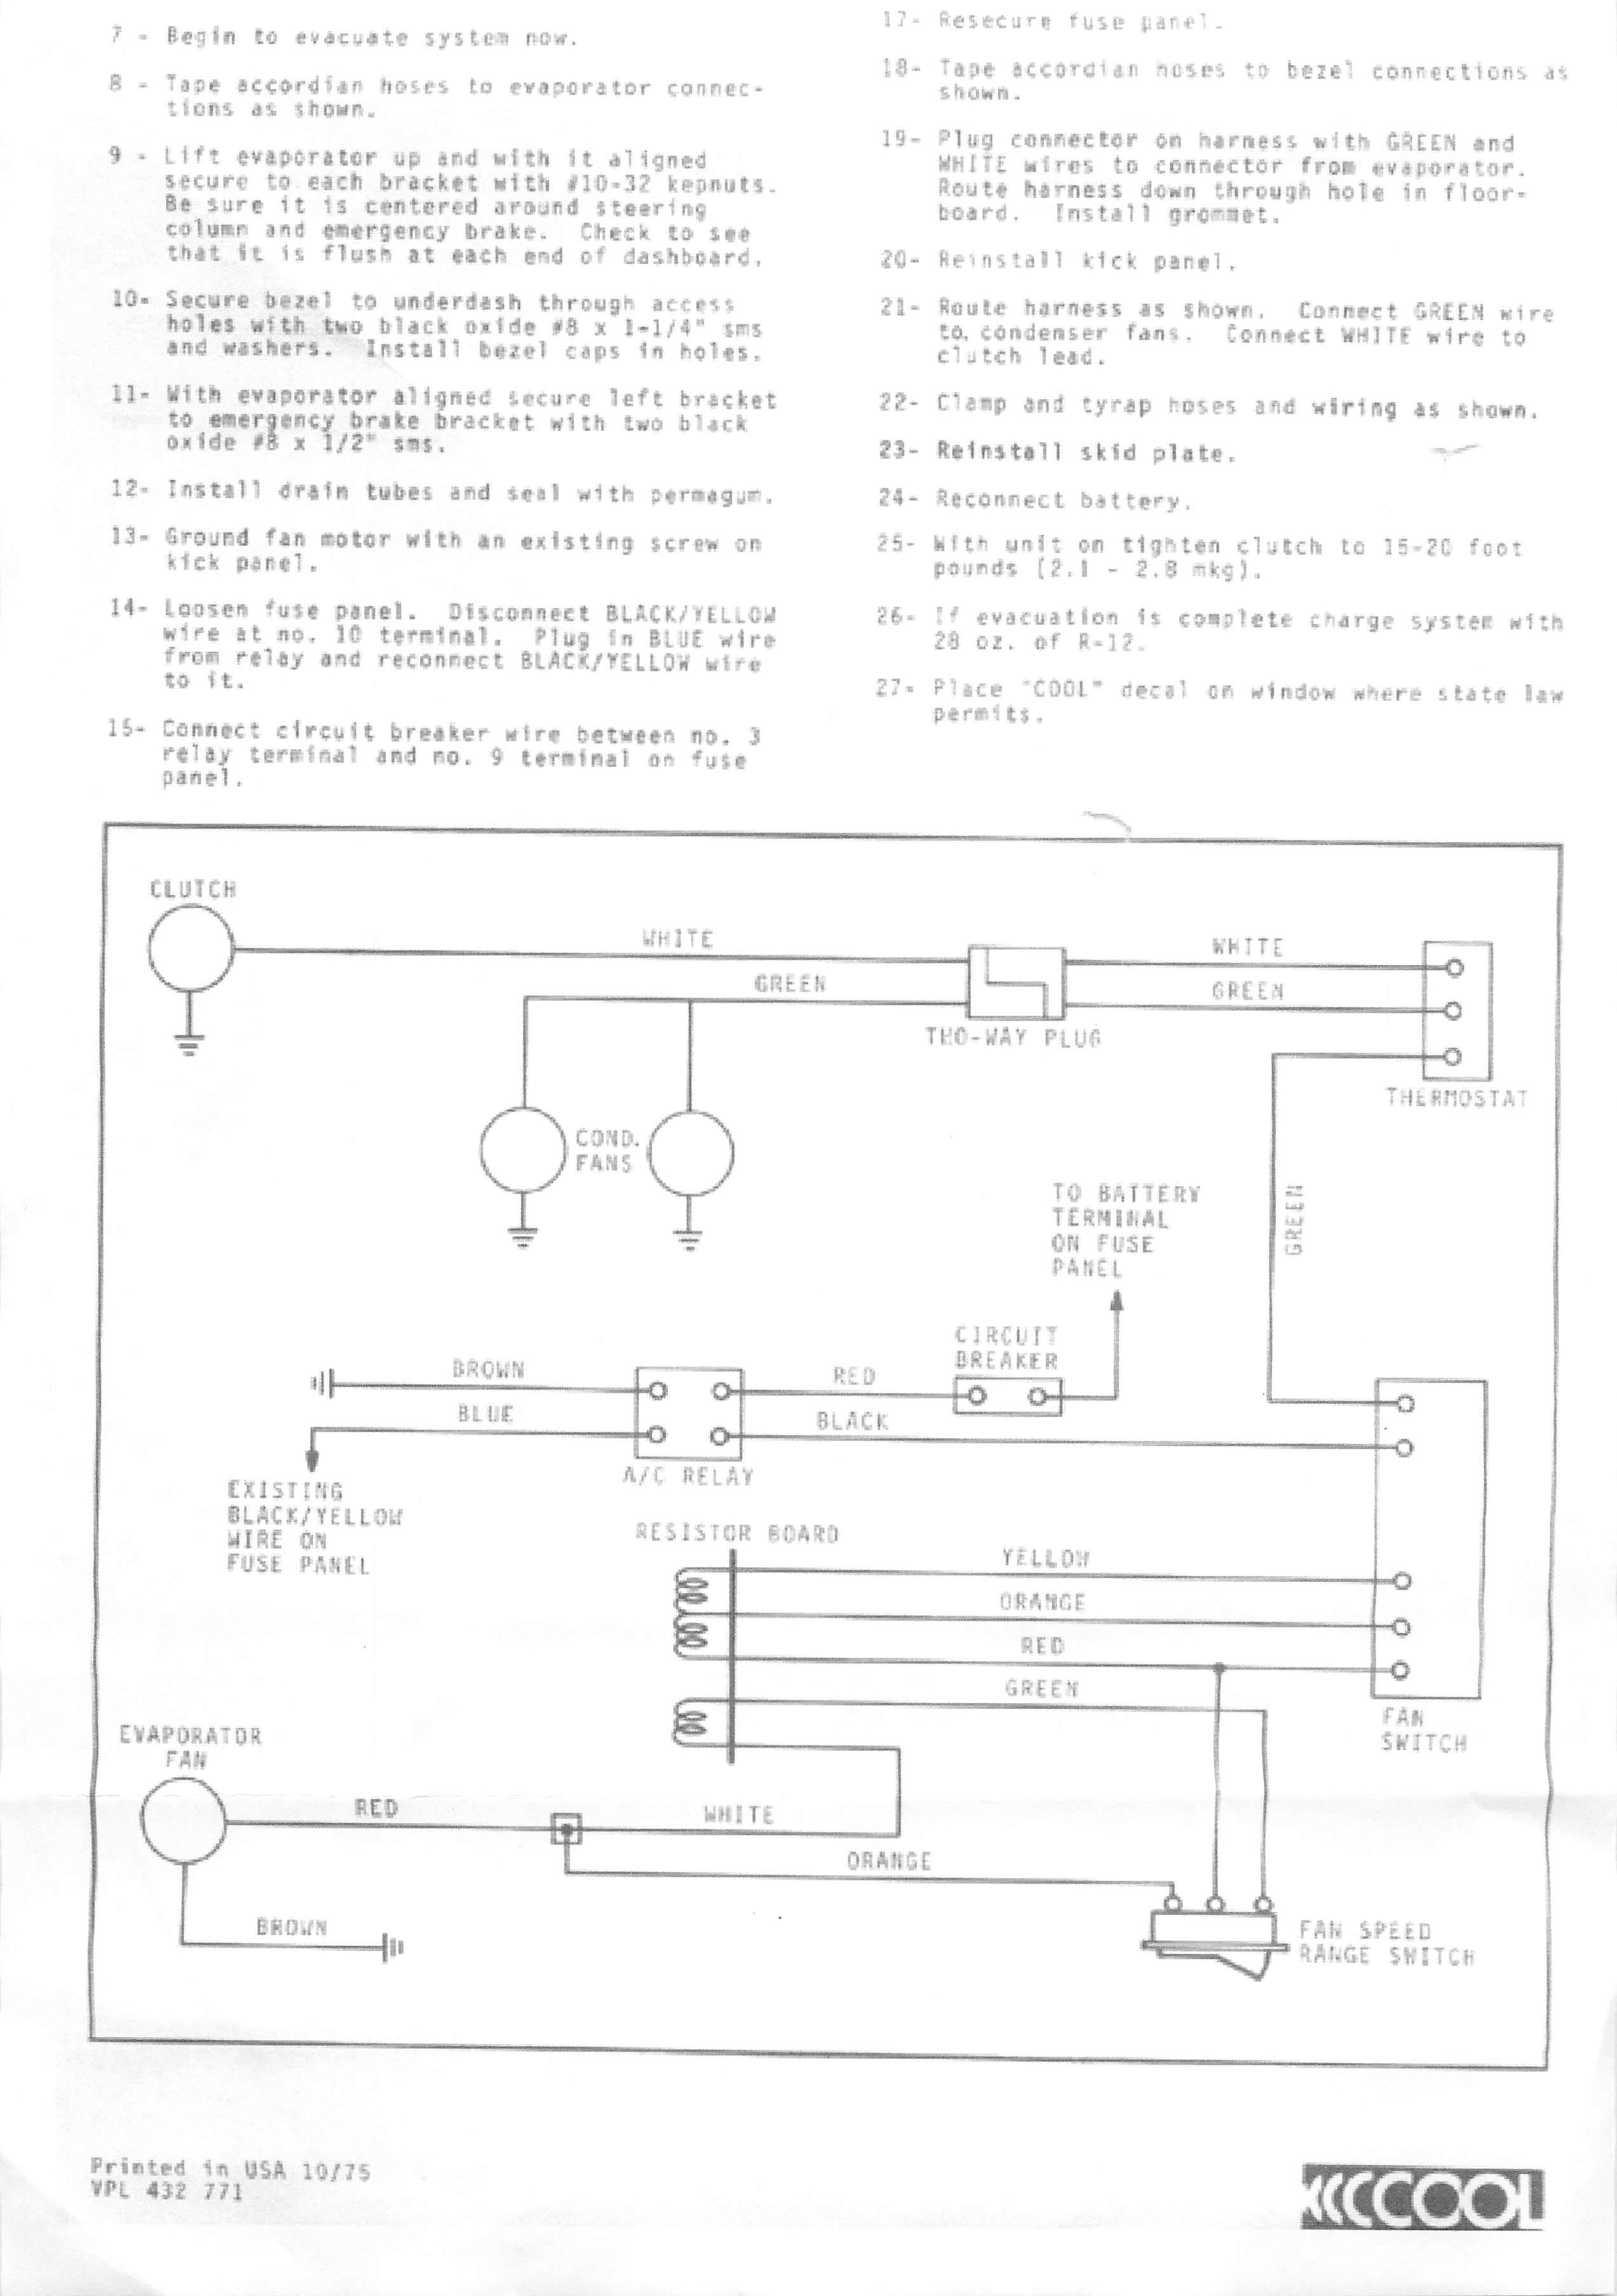 Thesamba Com    1976 Vw Bus Dpd Under Dash Air Conditioner Instructions